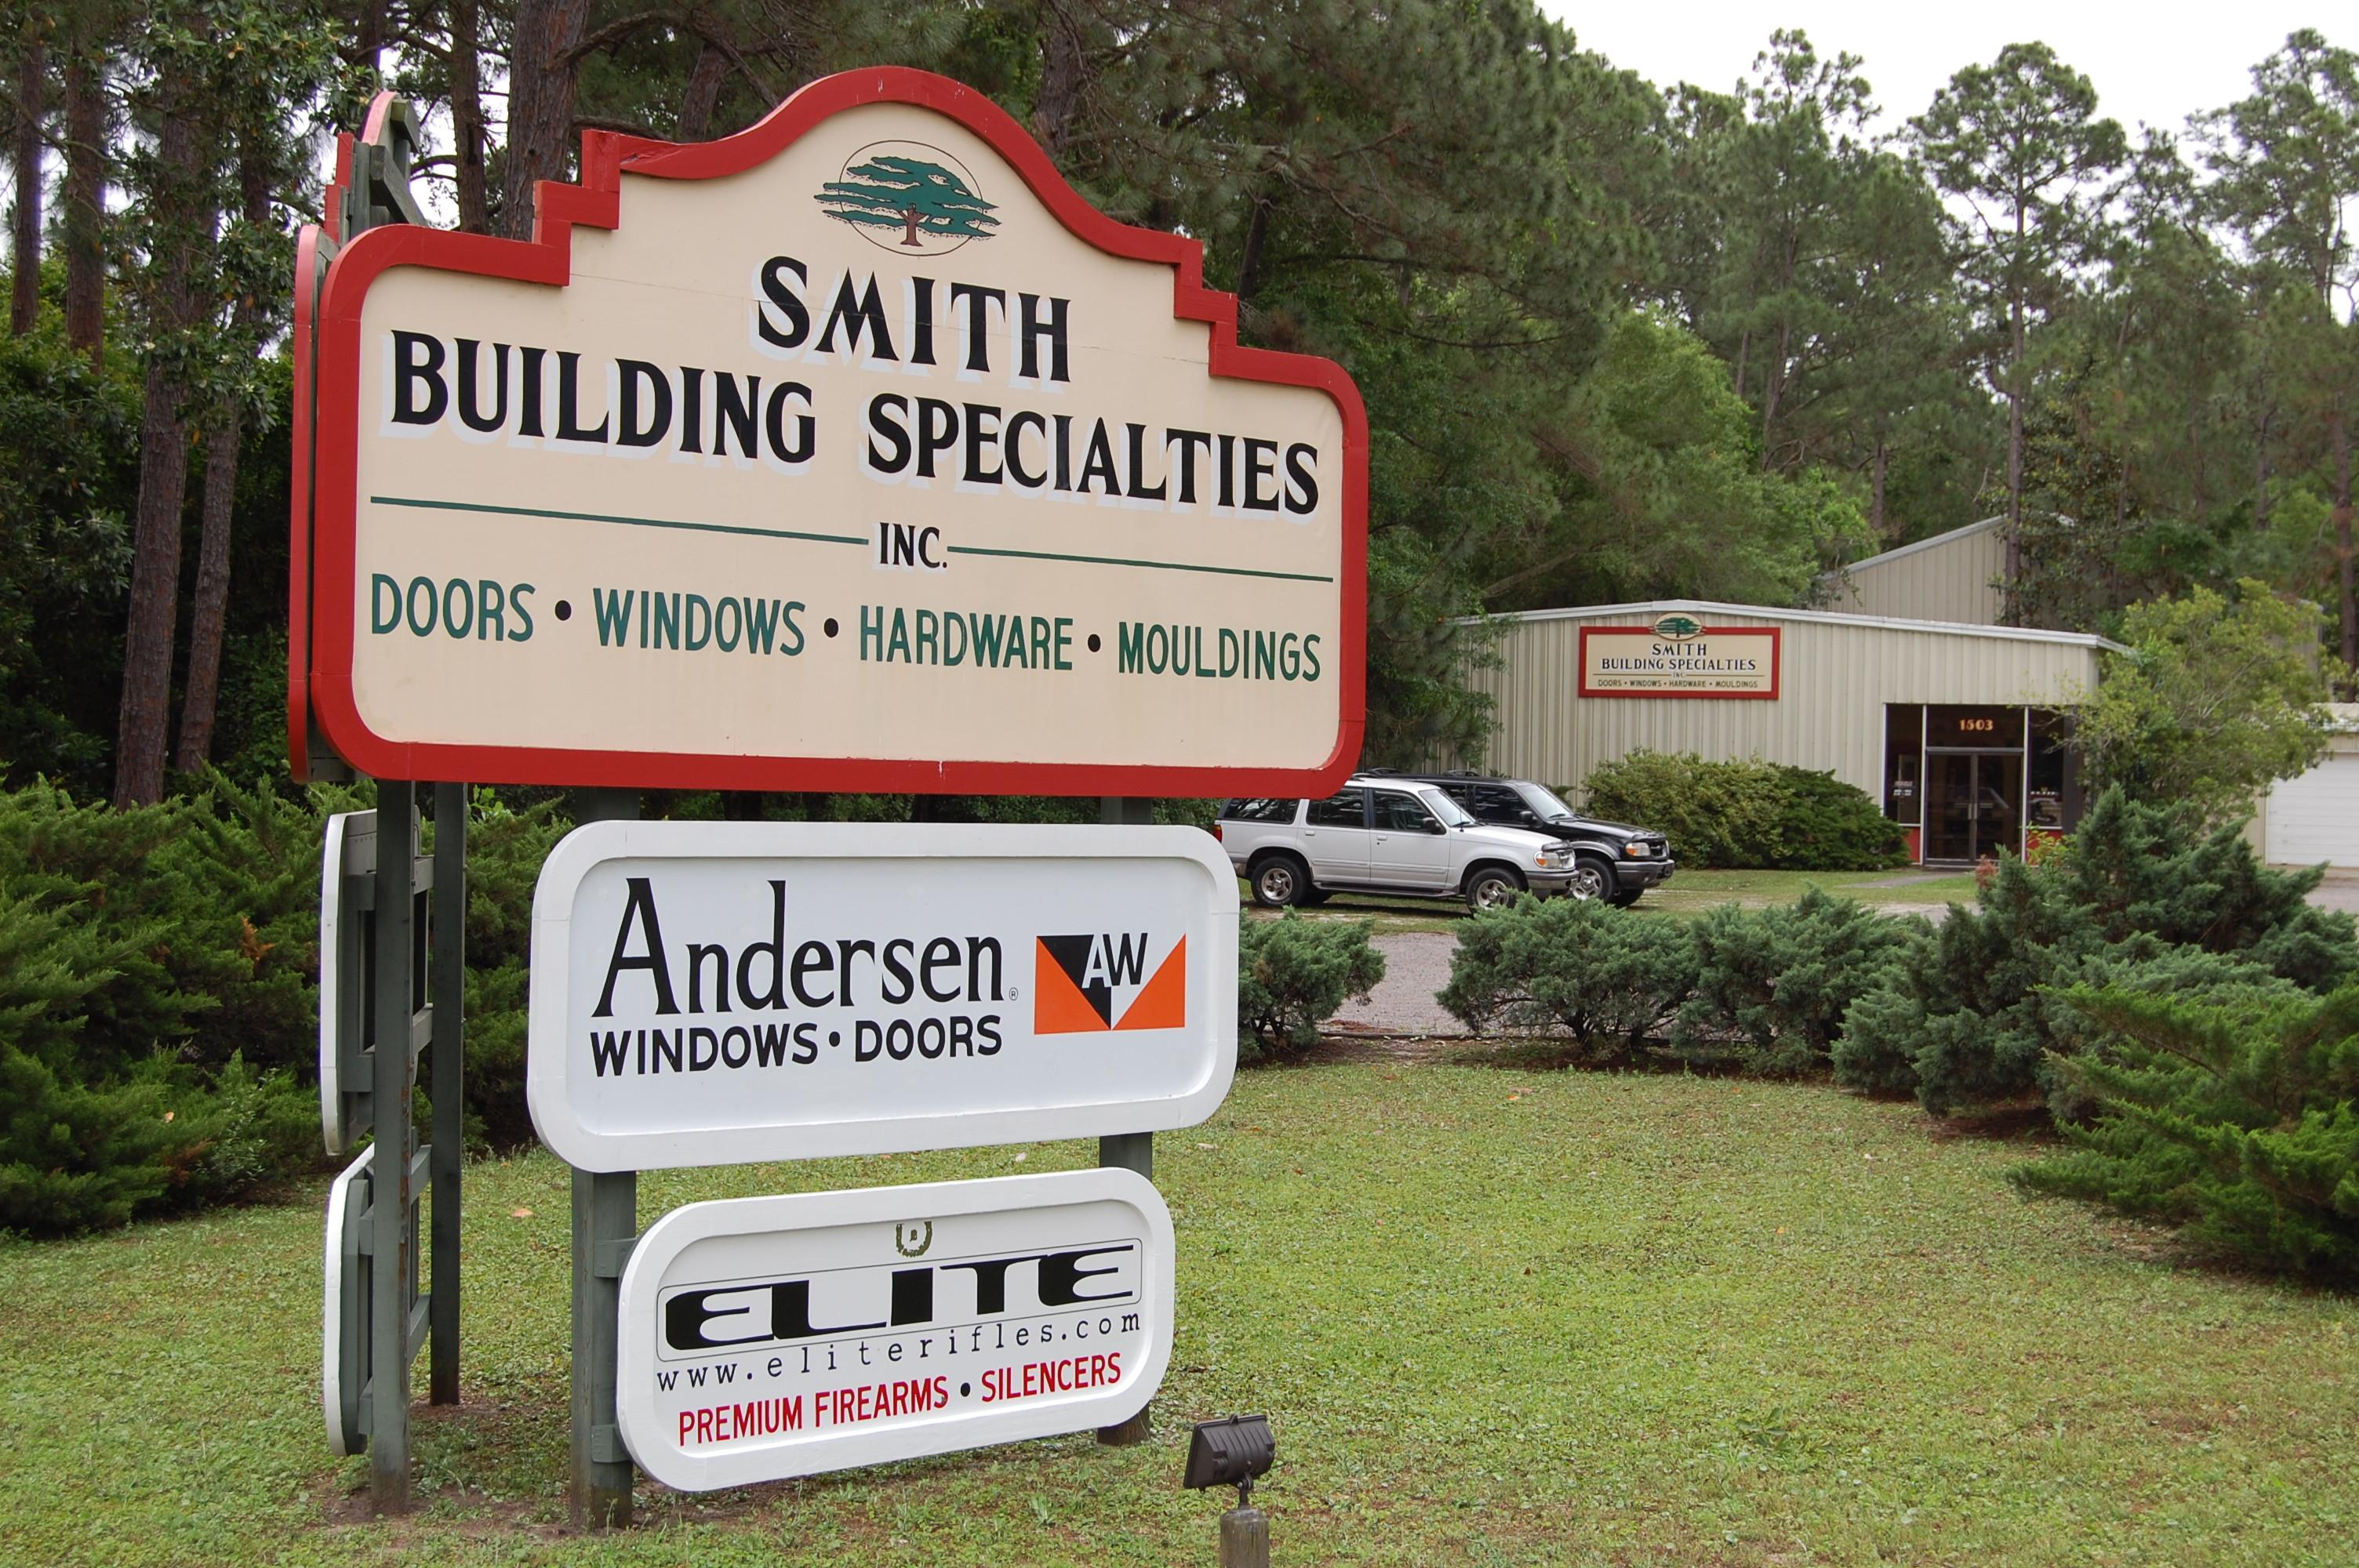 Smith Building Specialties Panama City Fl Business